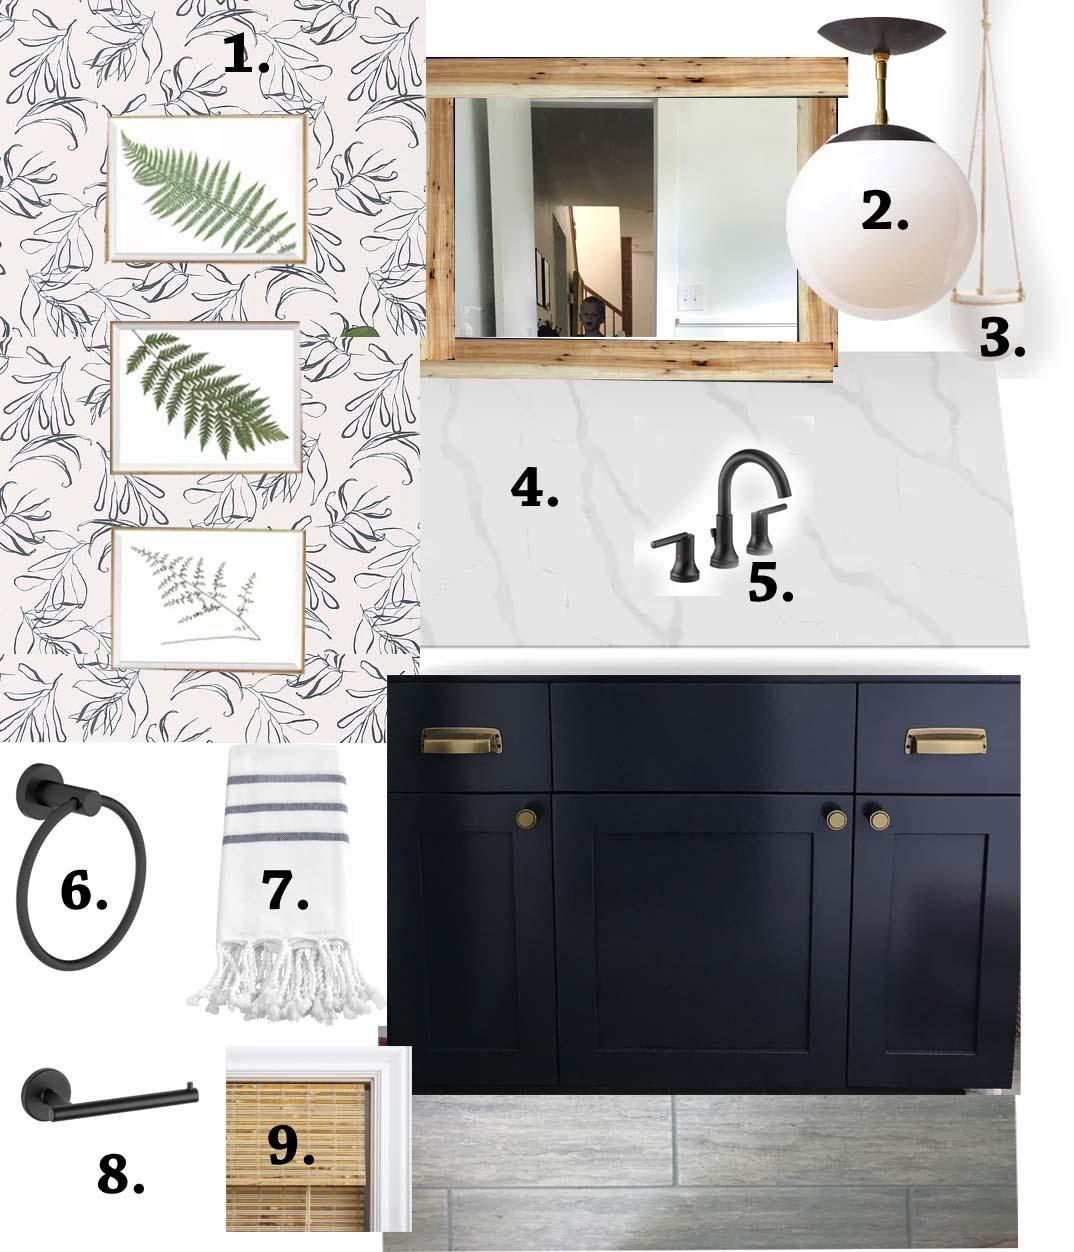 bathroomnumbered2.jpg